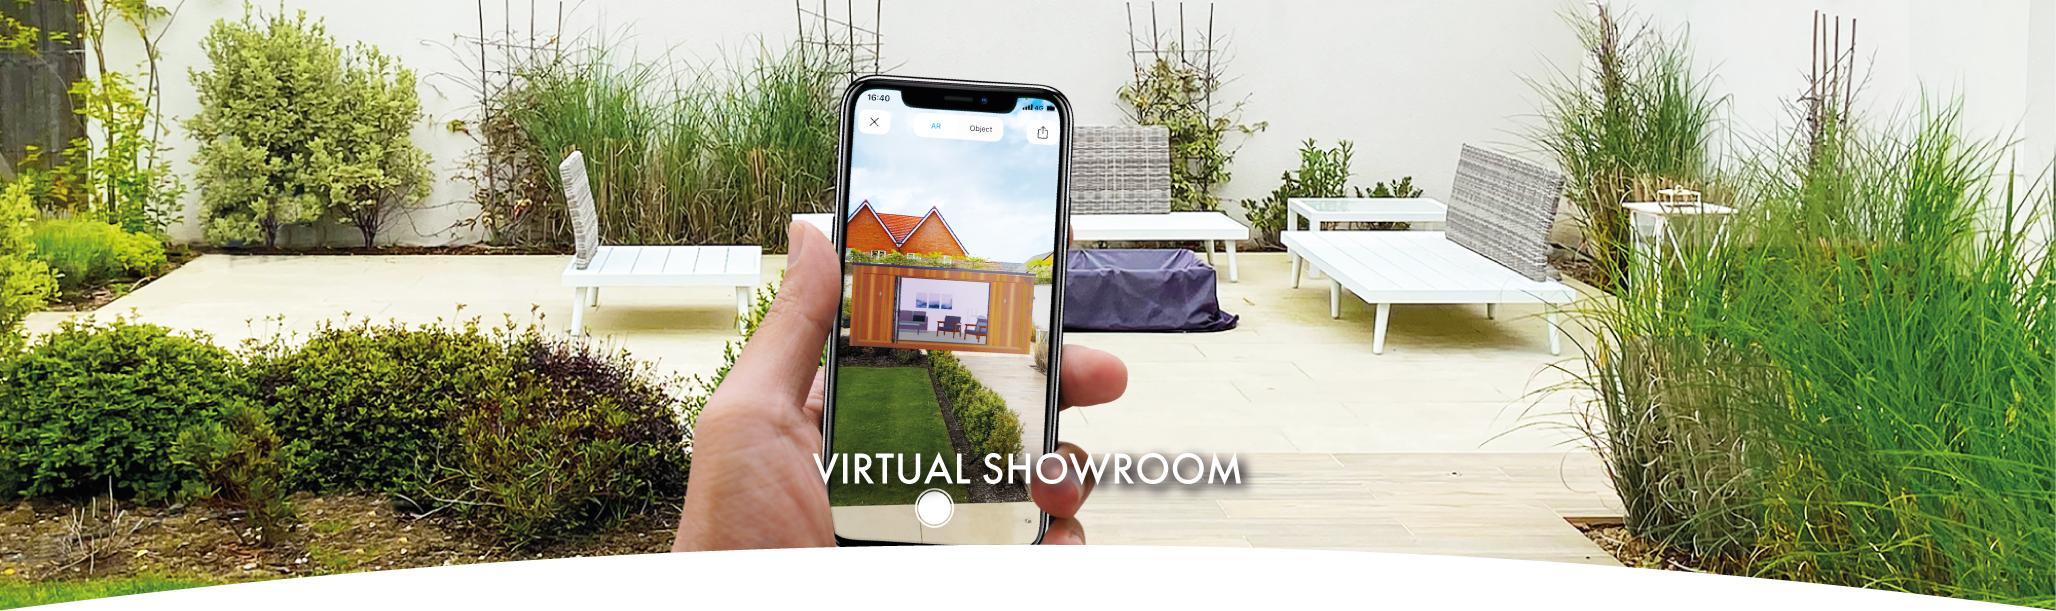 Virtual garden room showroom